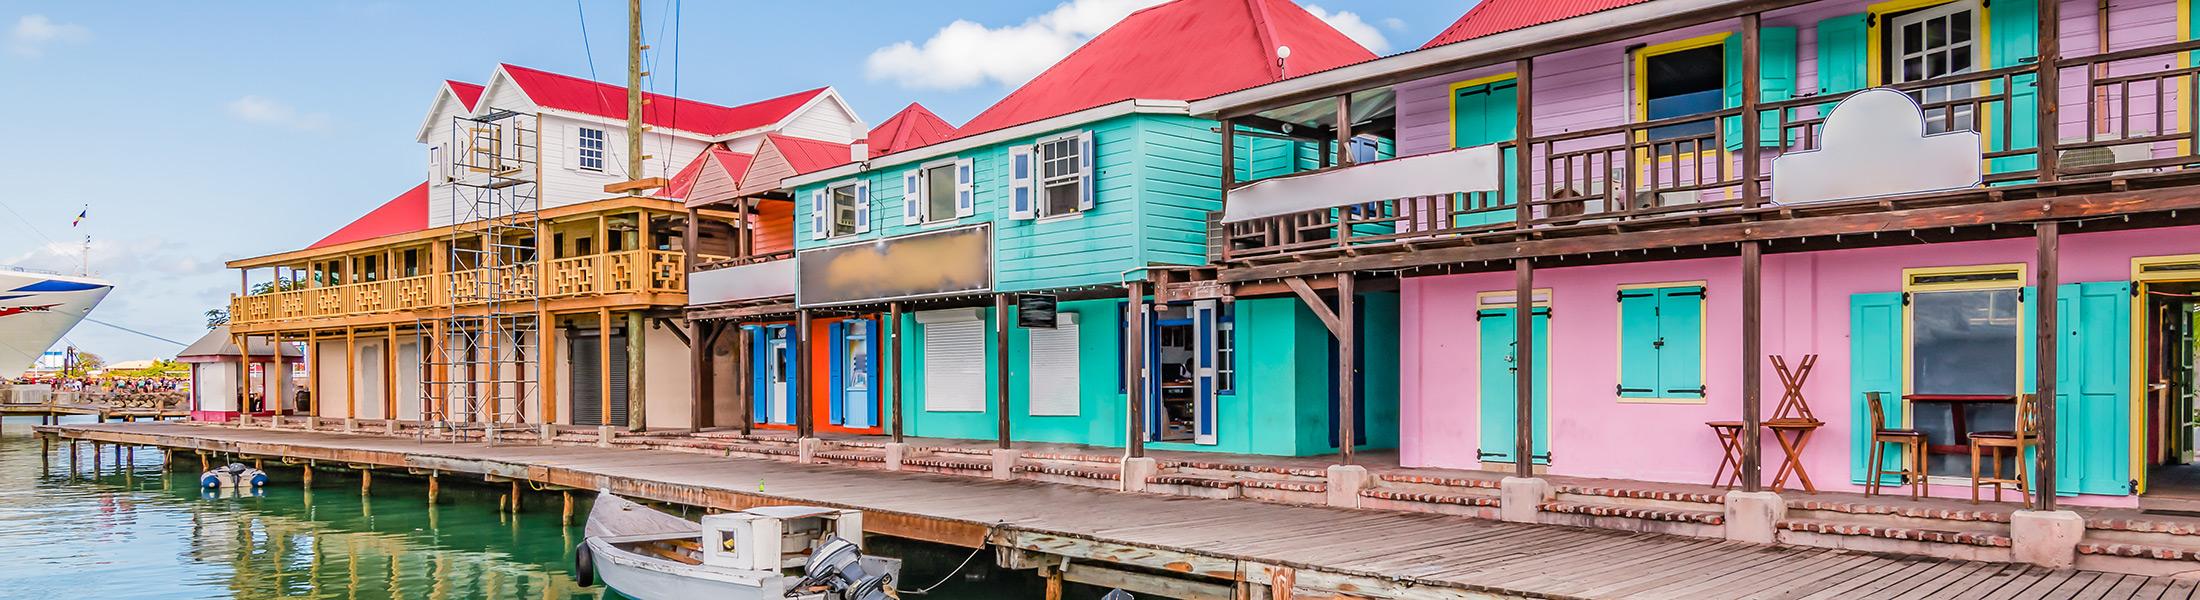 Colourful houses in St John's in Antigua